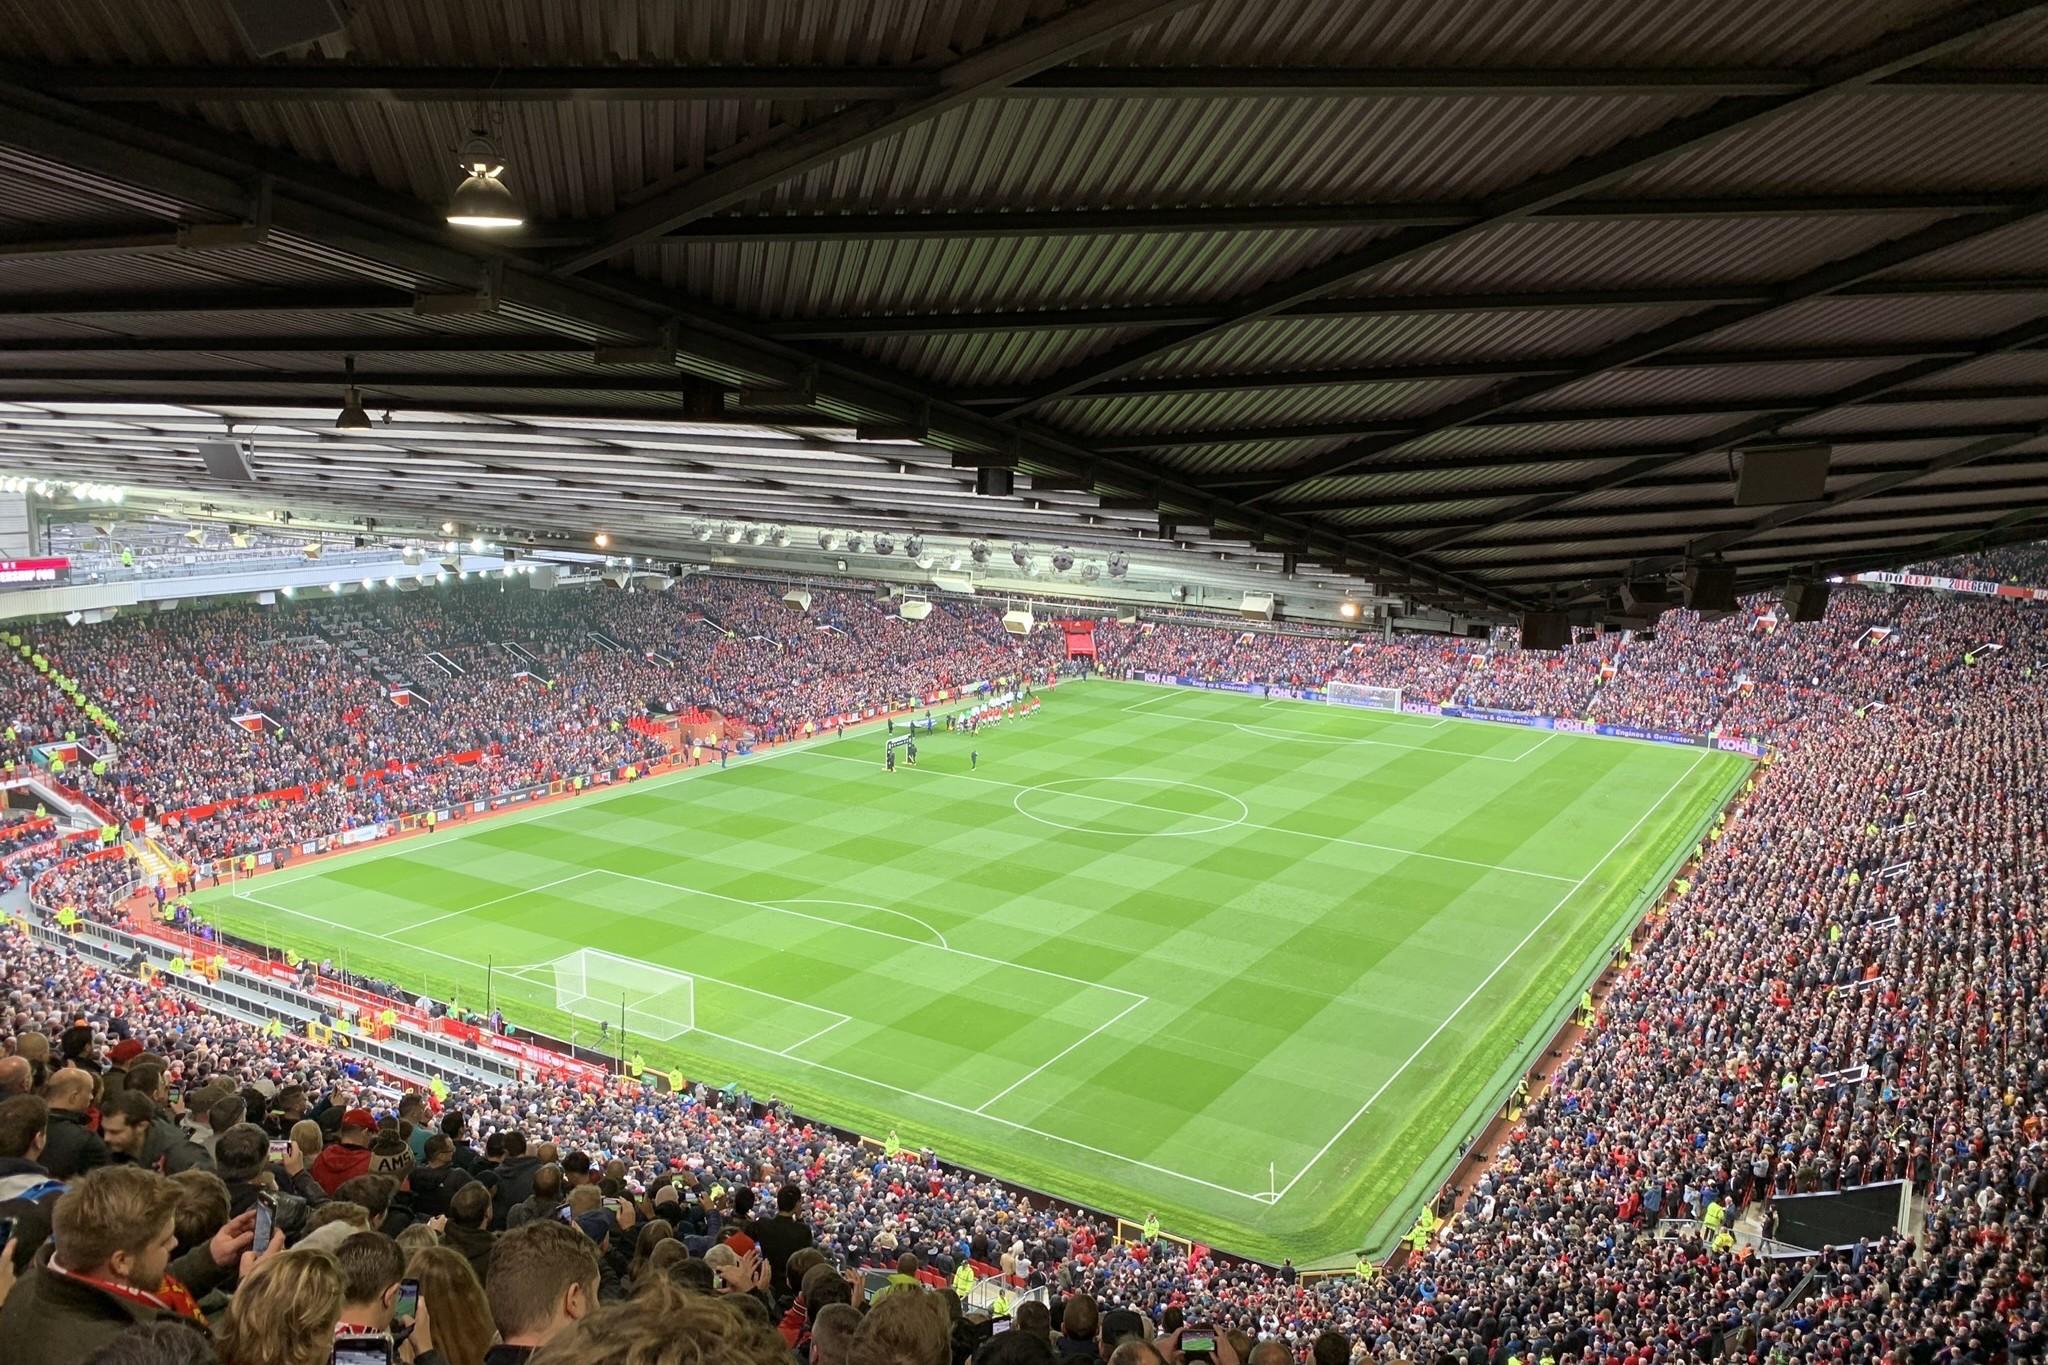 Old Trafford, Manchester United, England